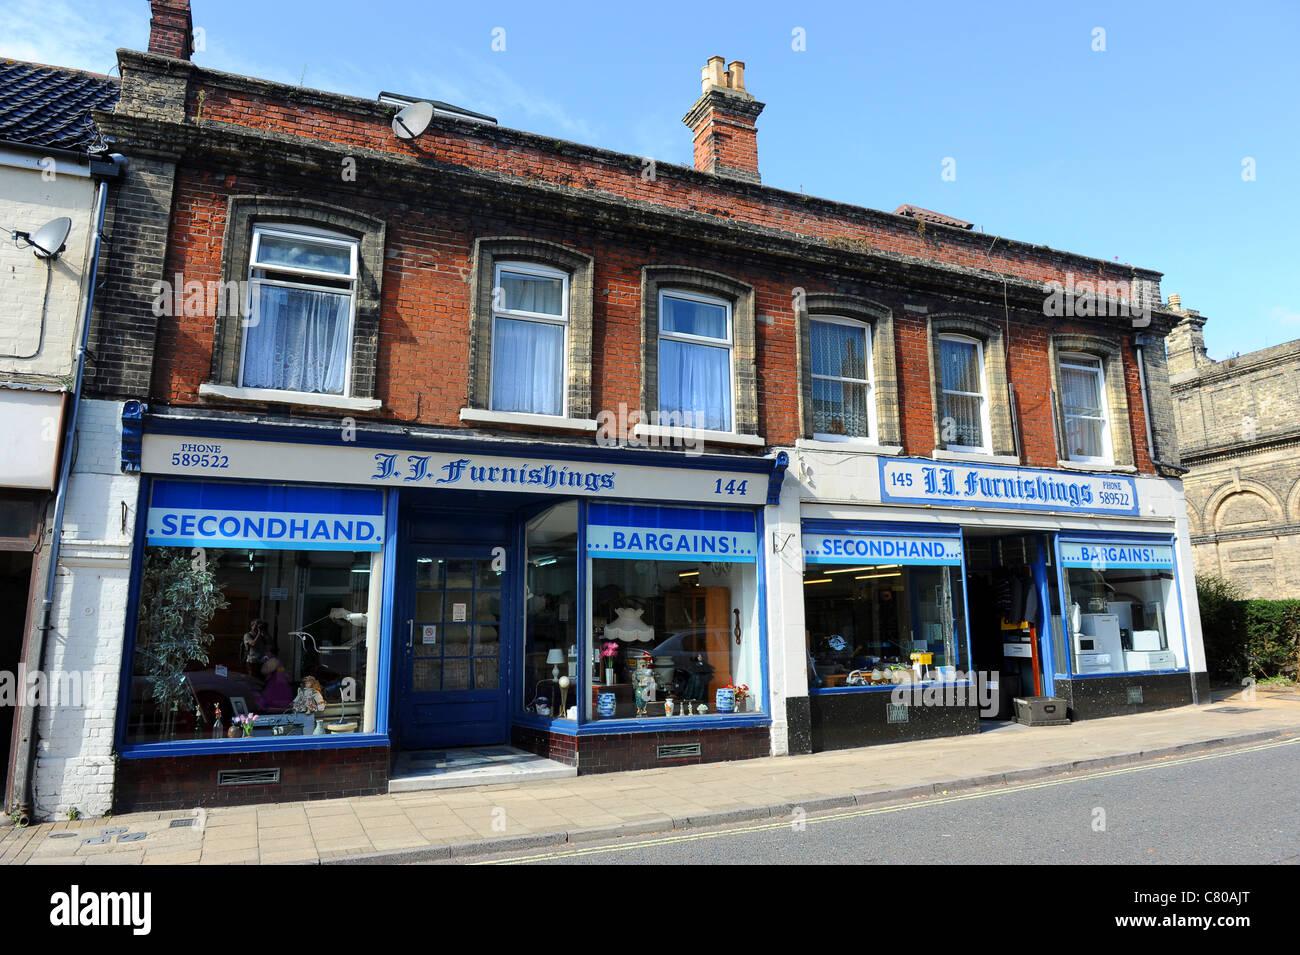 Lowestoft secondhand furniture shop Suffolk England Uk - Stock Image